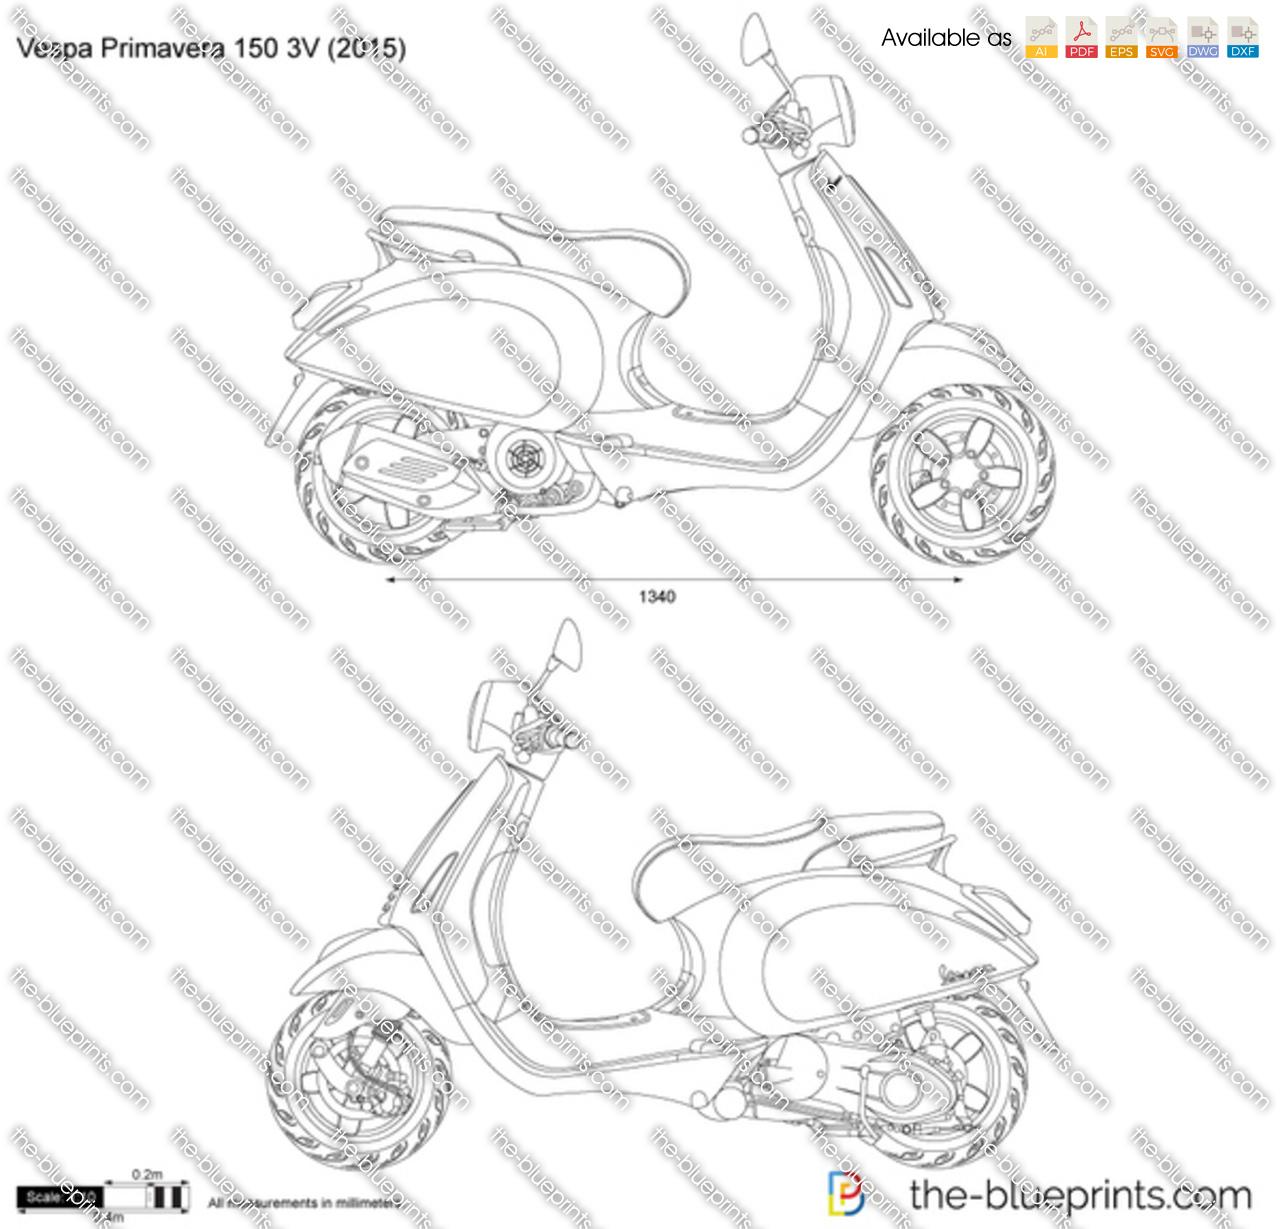 Vespa Primavera 150 3V vector drawing